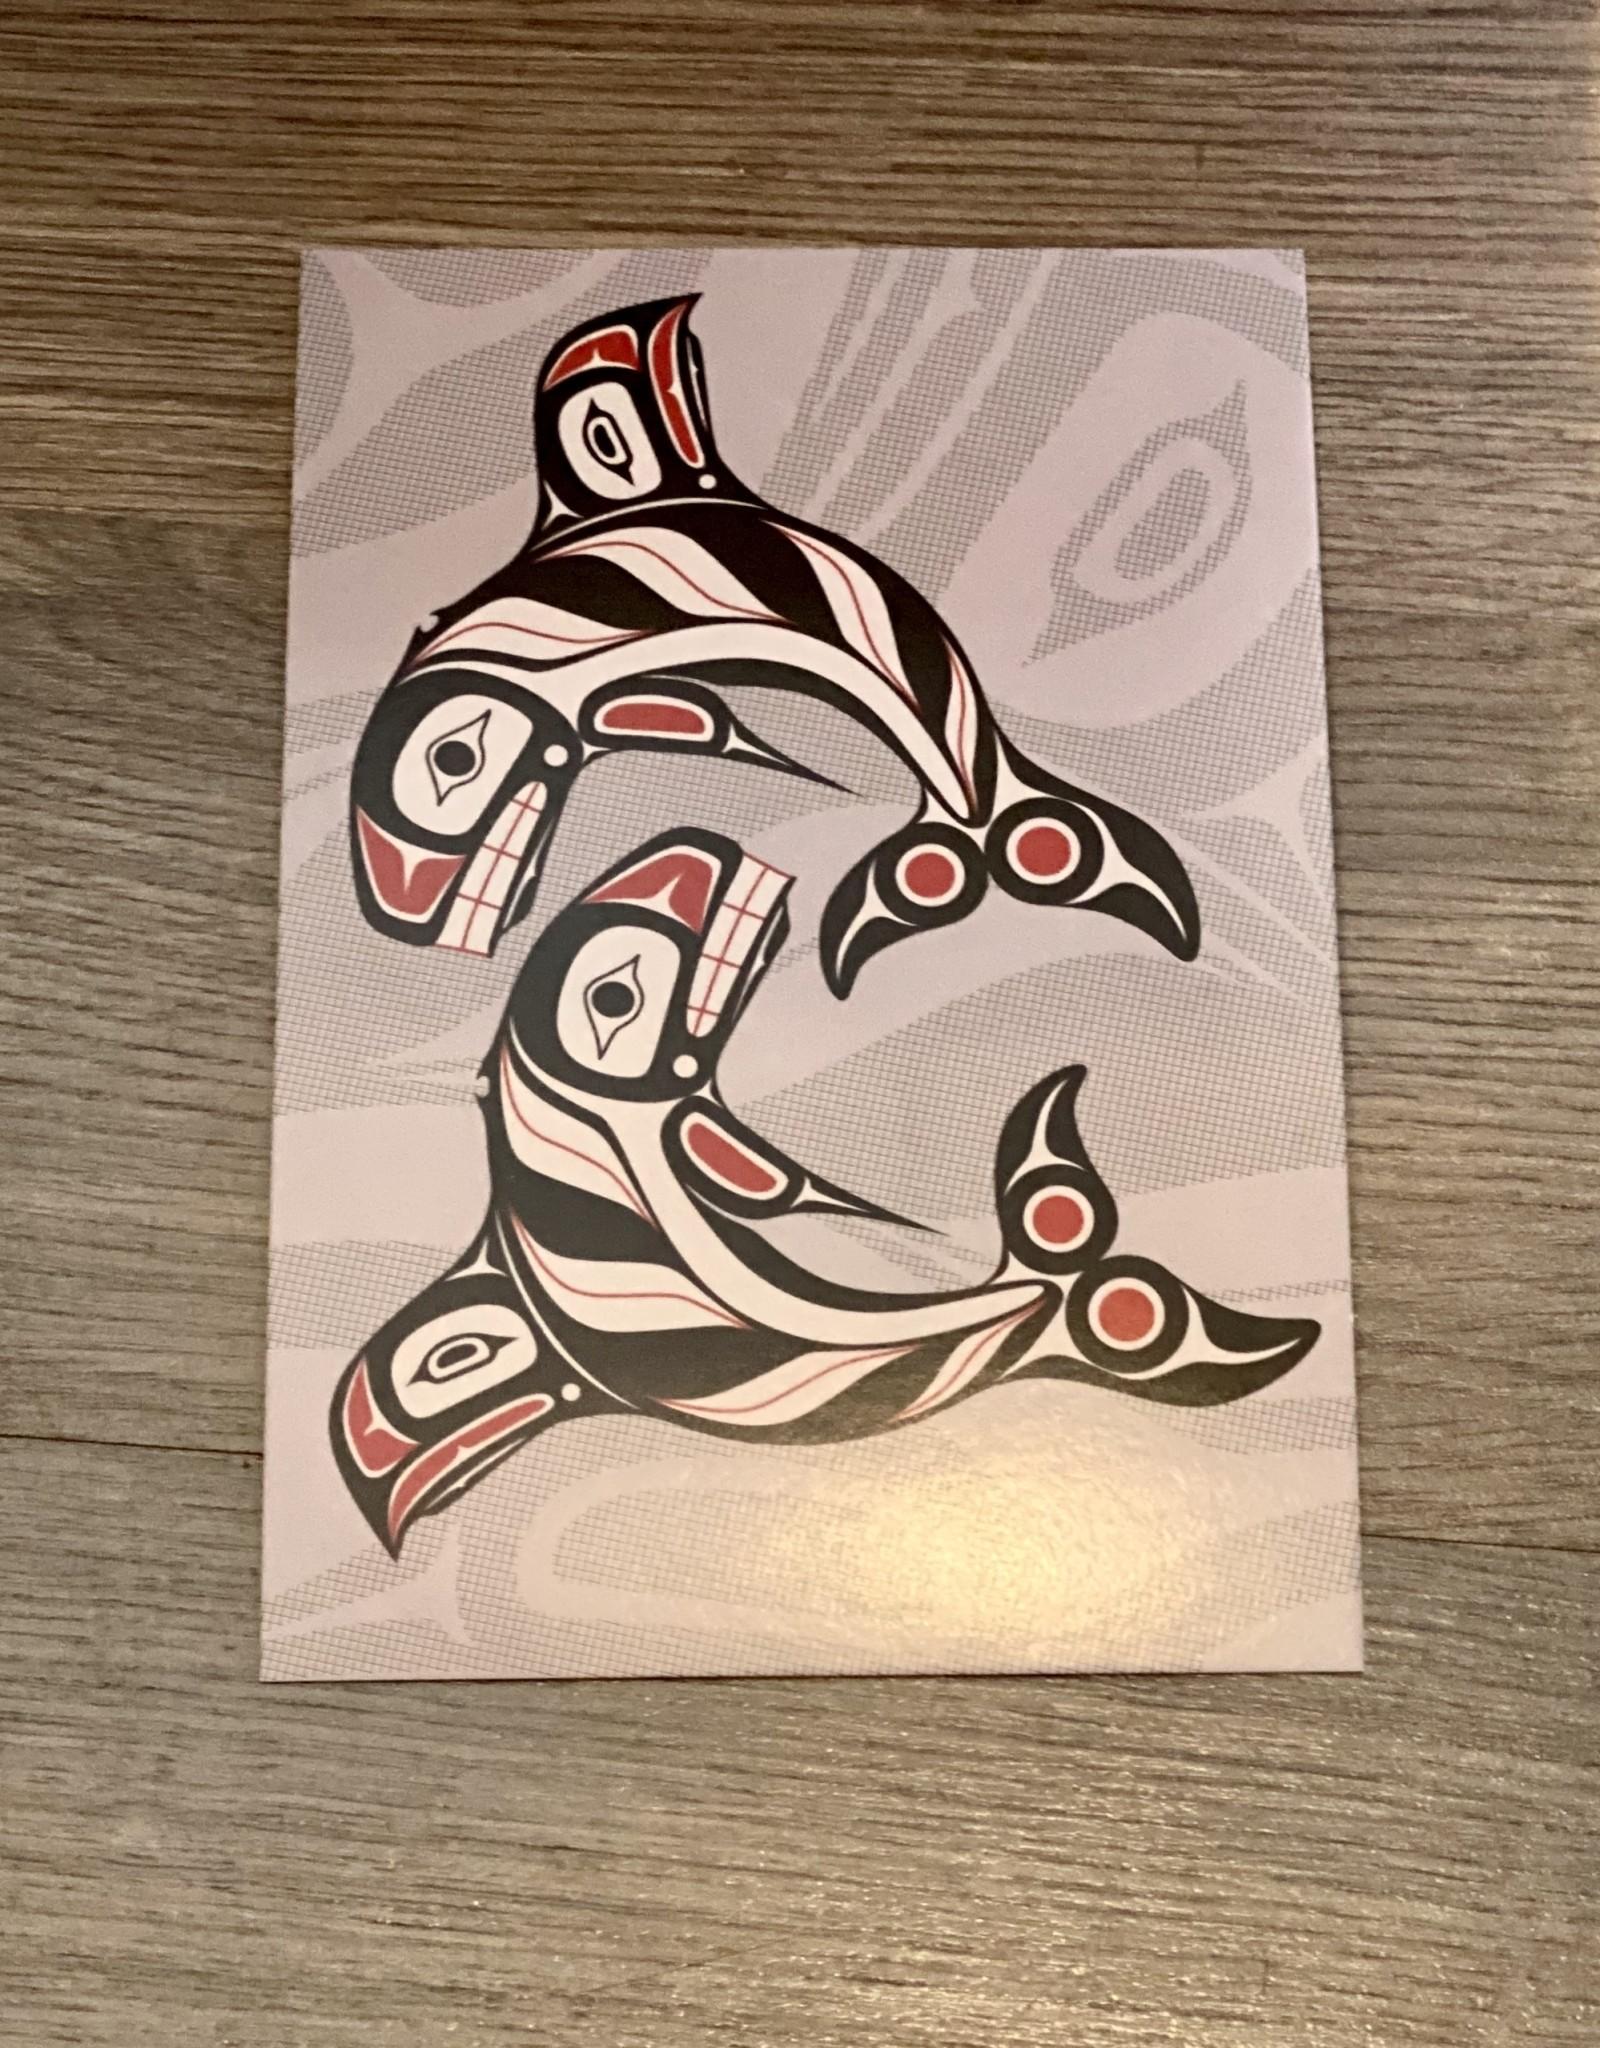 Purple Pigeon Treasures Post Card - Raven Fin Killer Whale